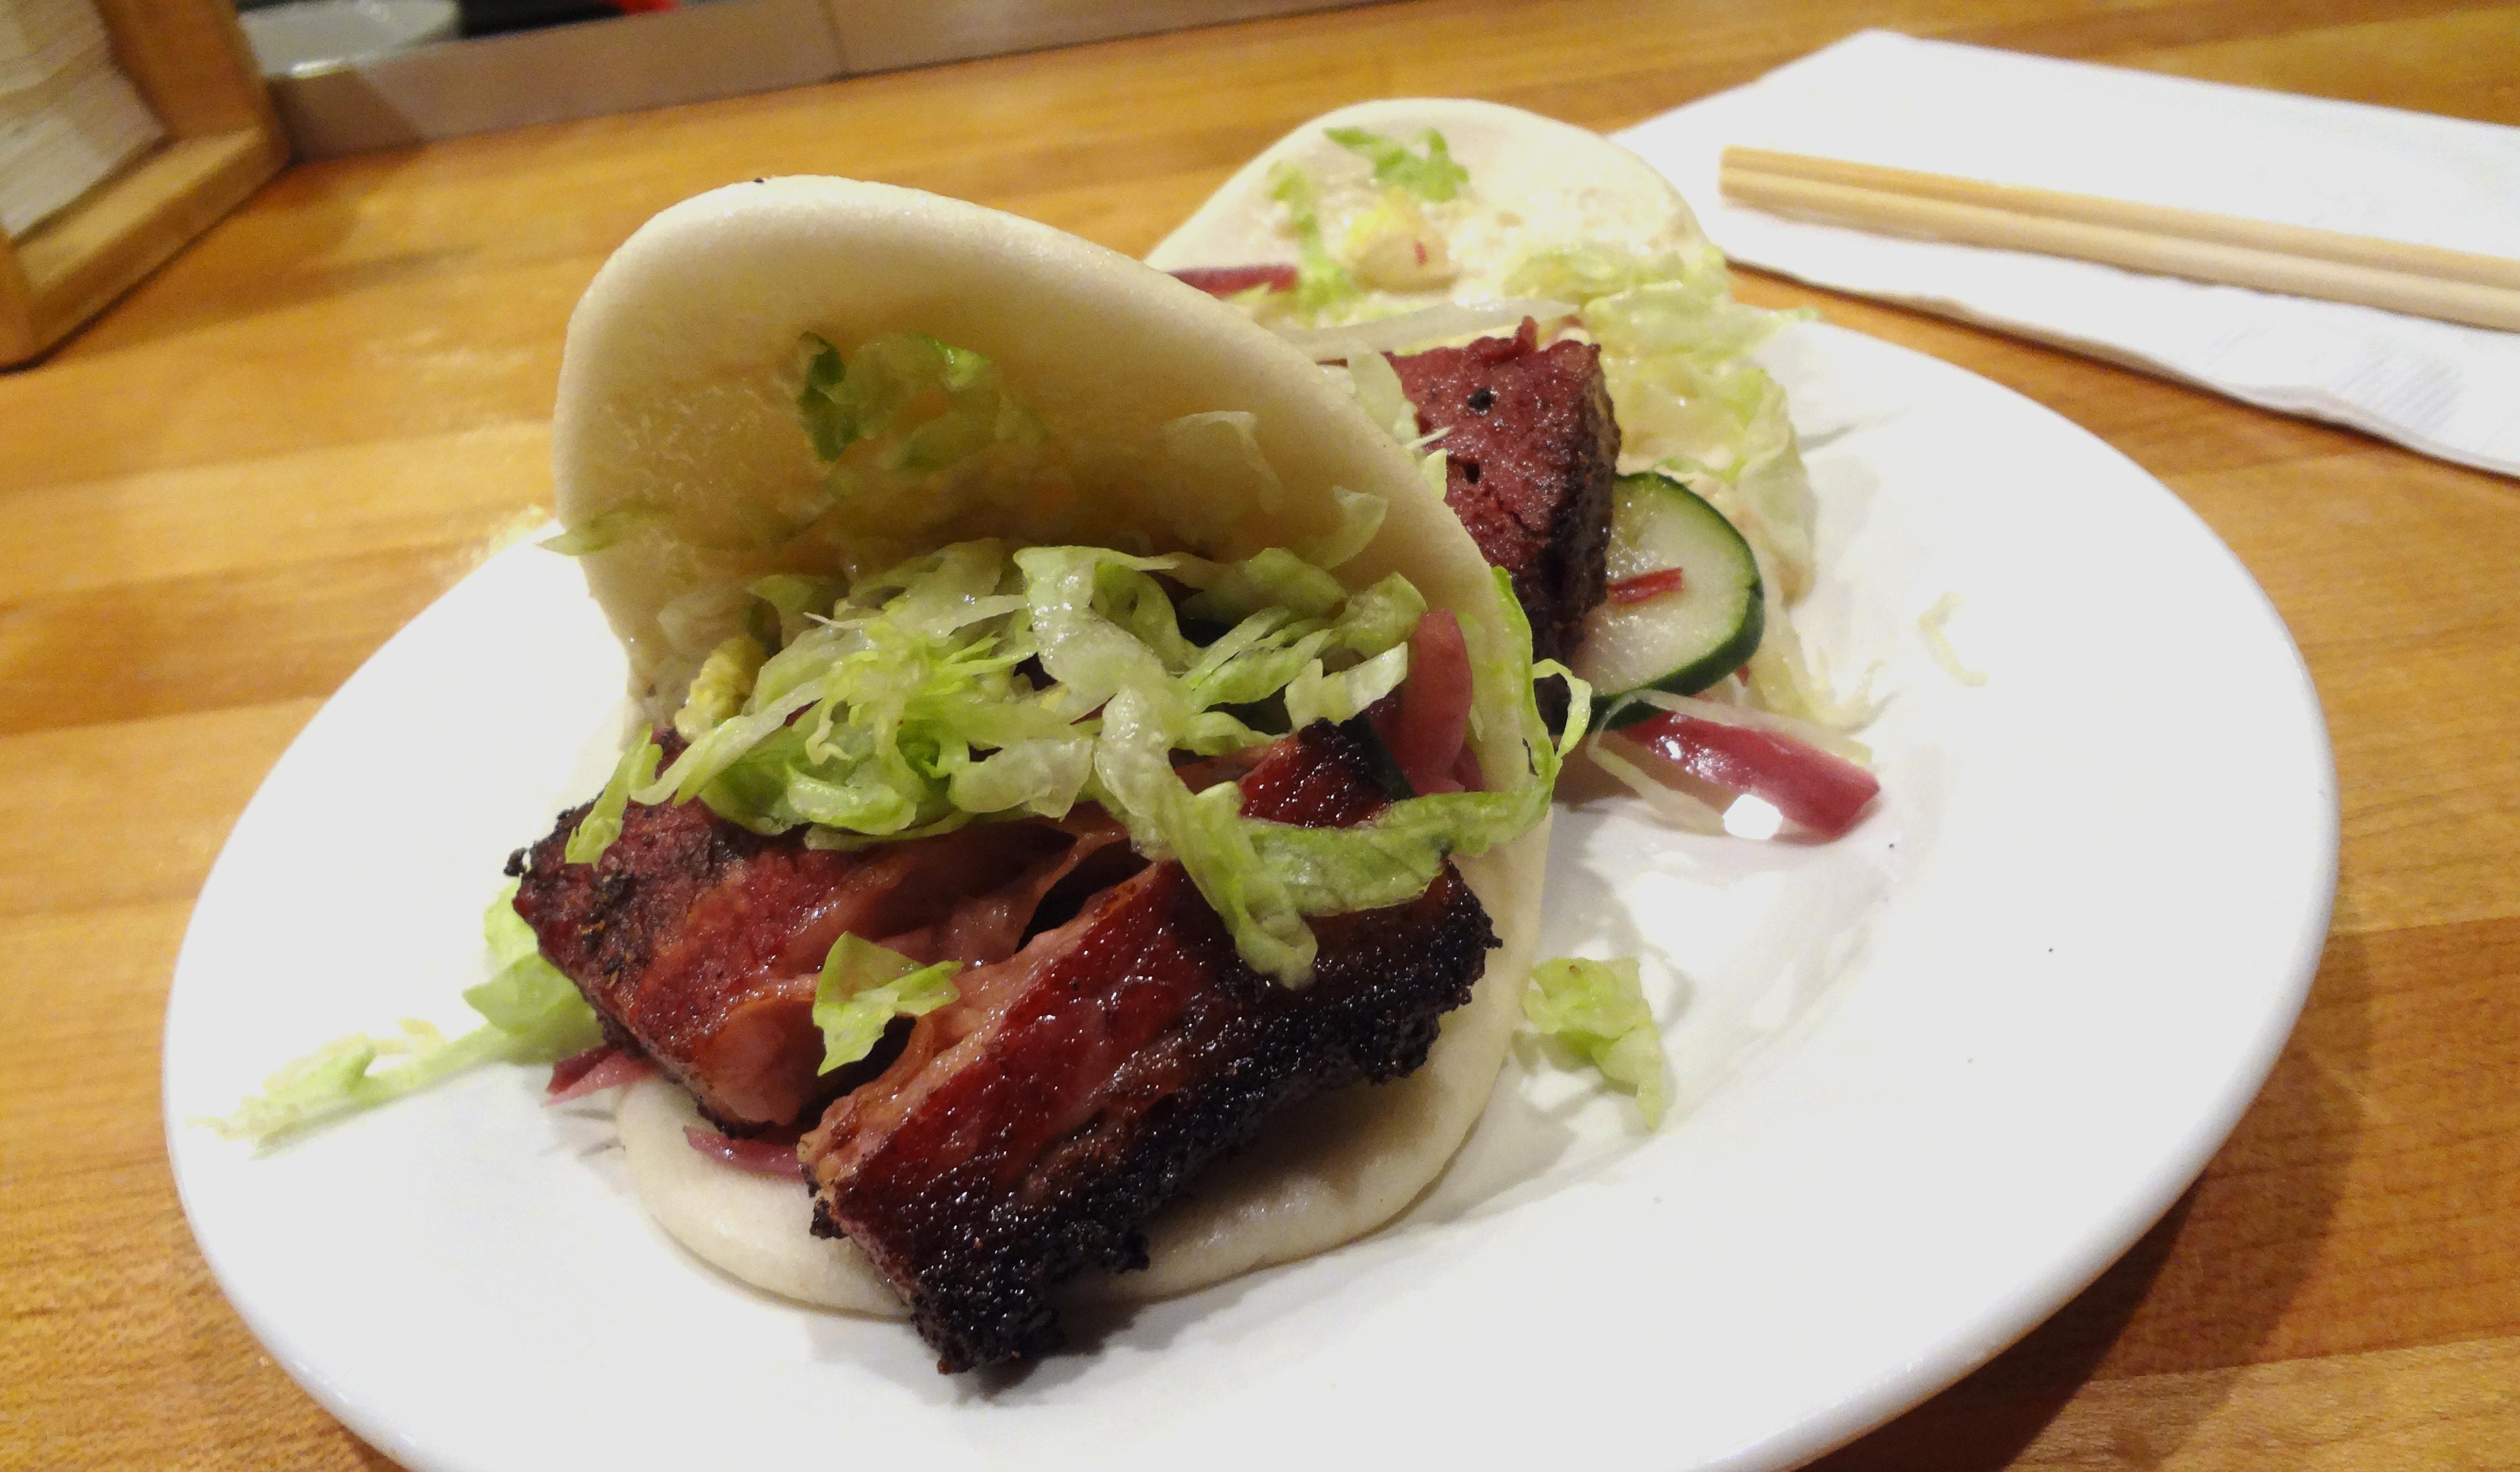 Momofuku pork buns